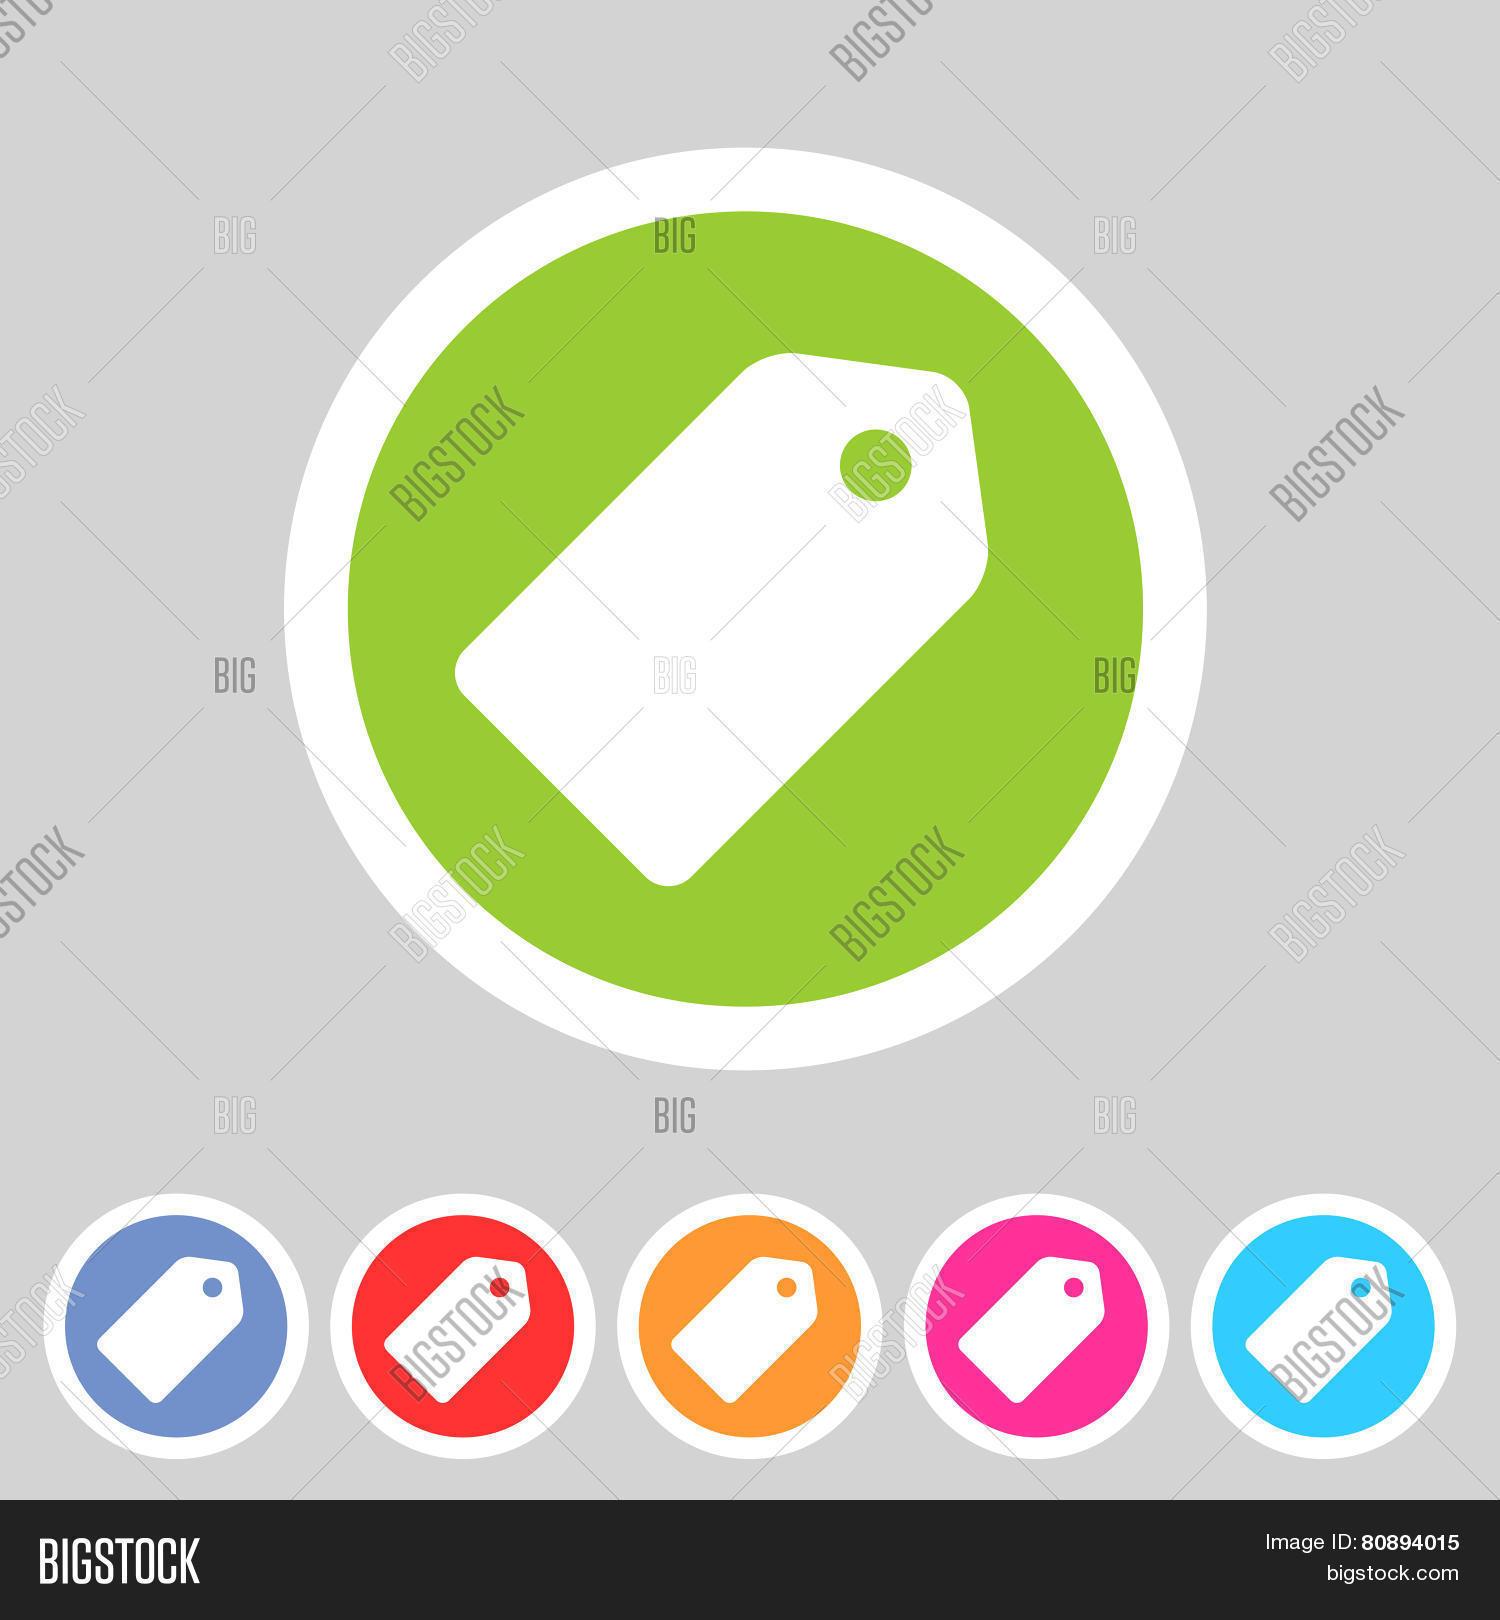 Price Tag Flat Icon Label Vector & Photo | Bigstock